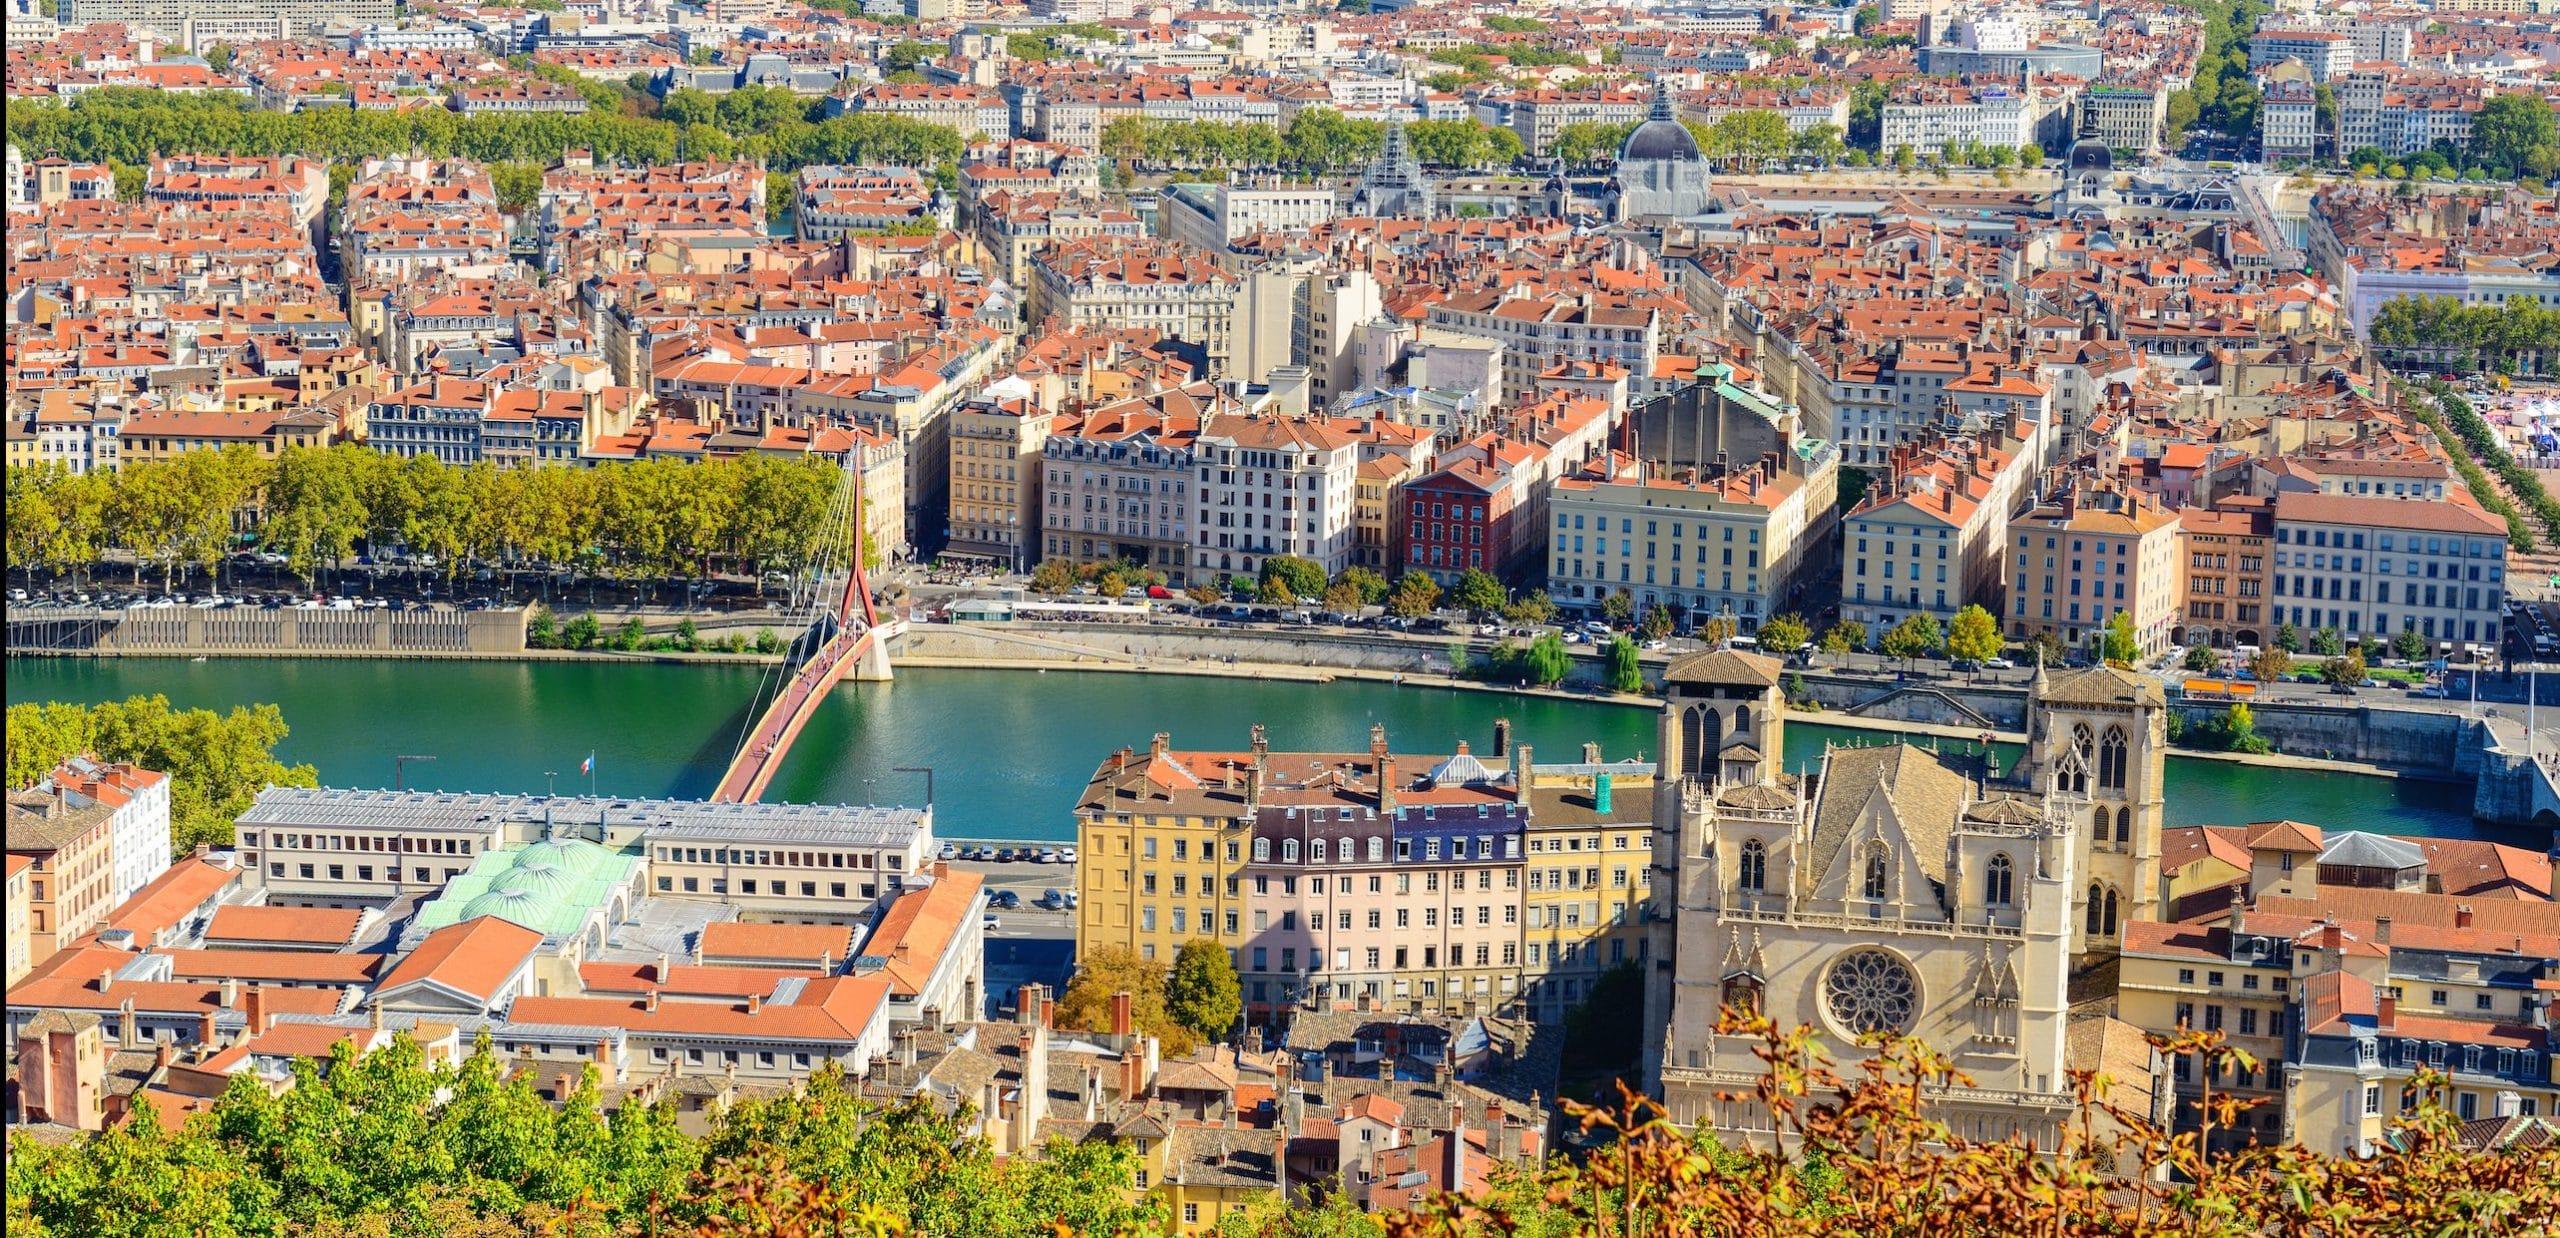 Auvergne-Rhône-Alpes - Vue d'ensemble